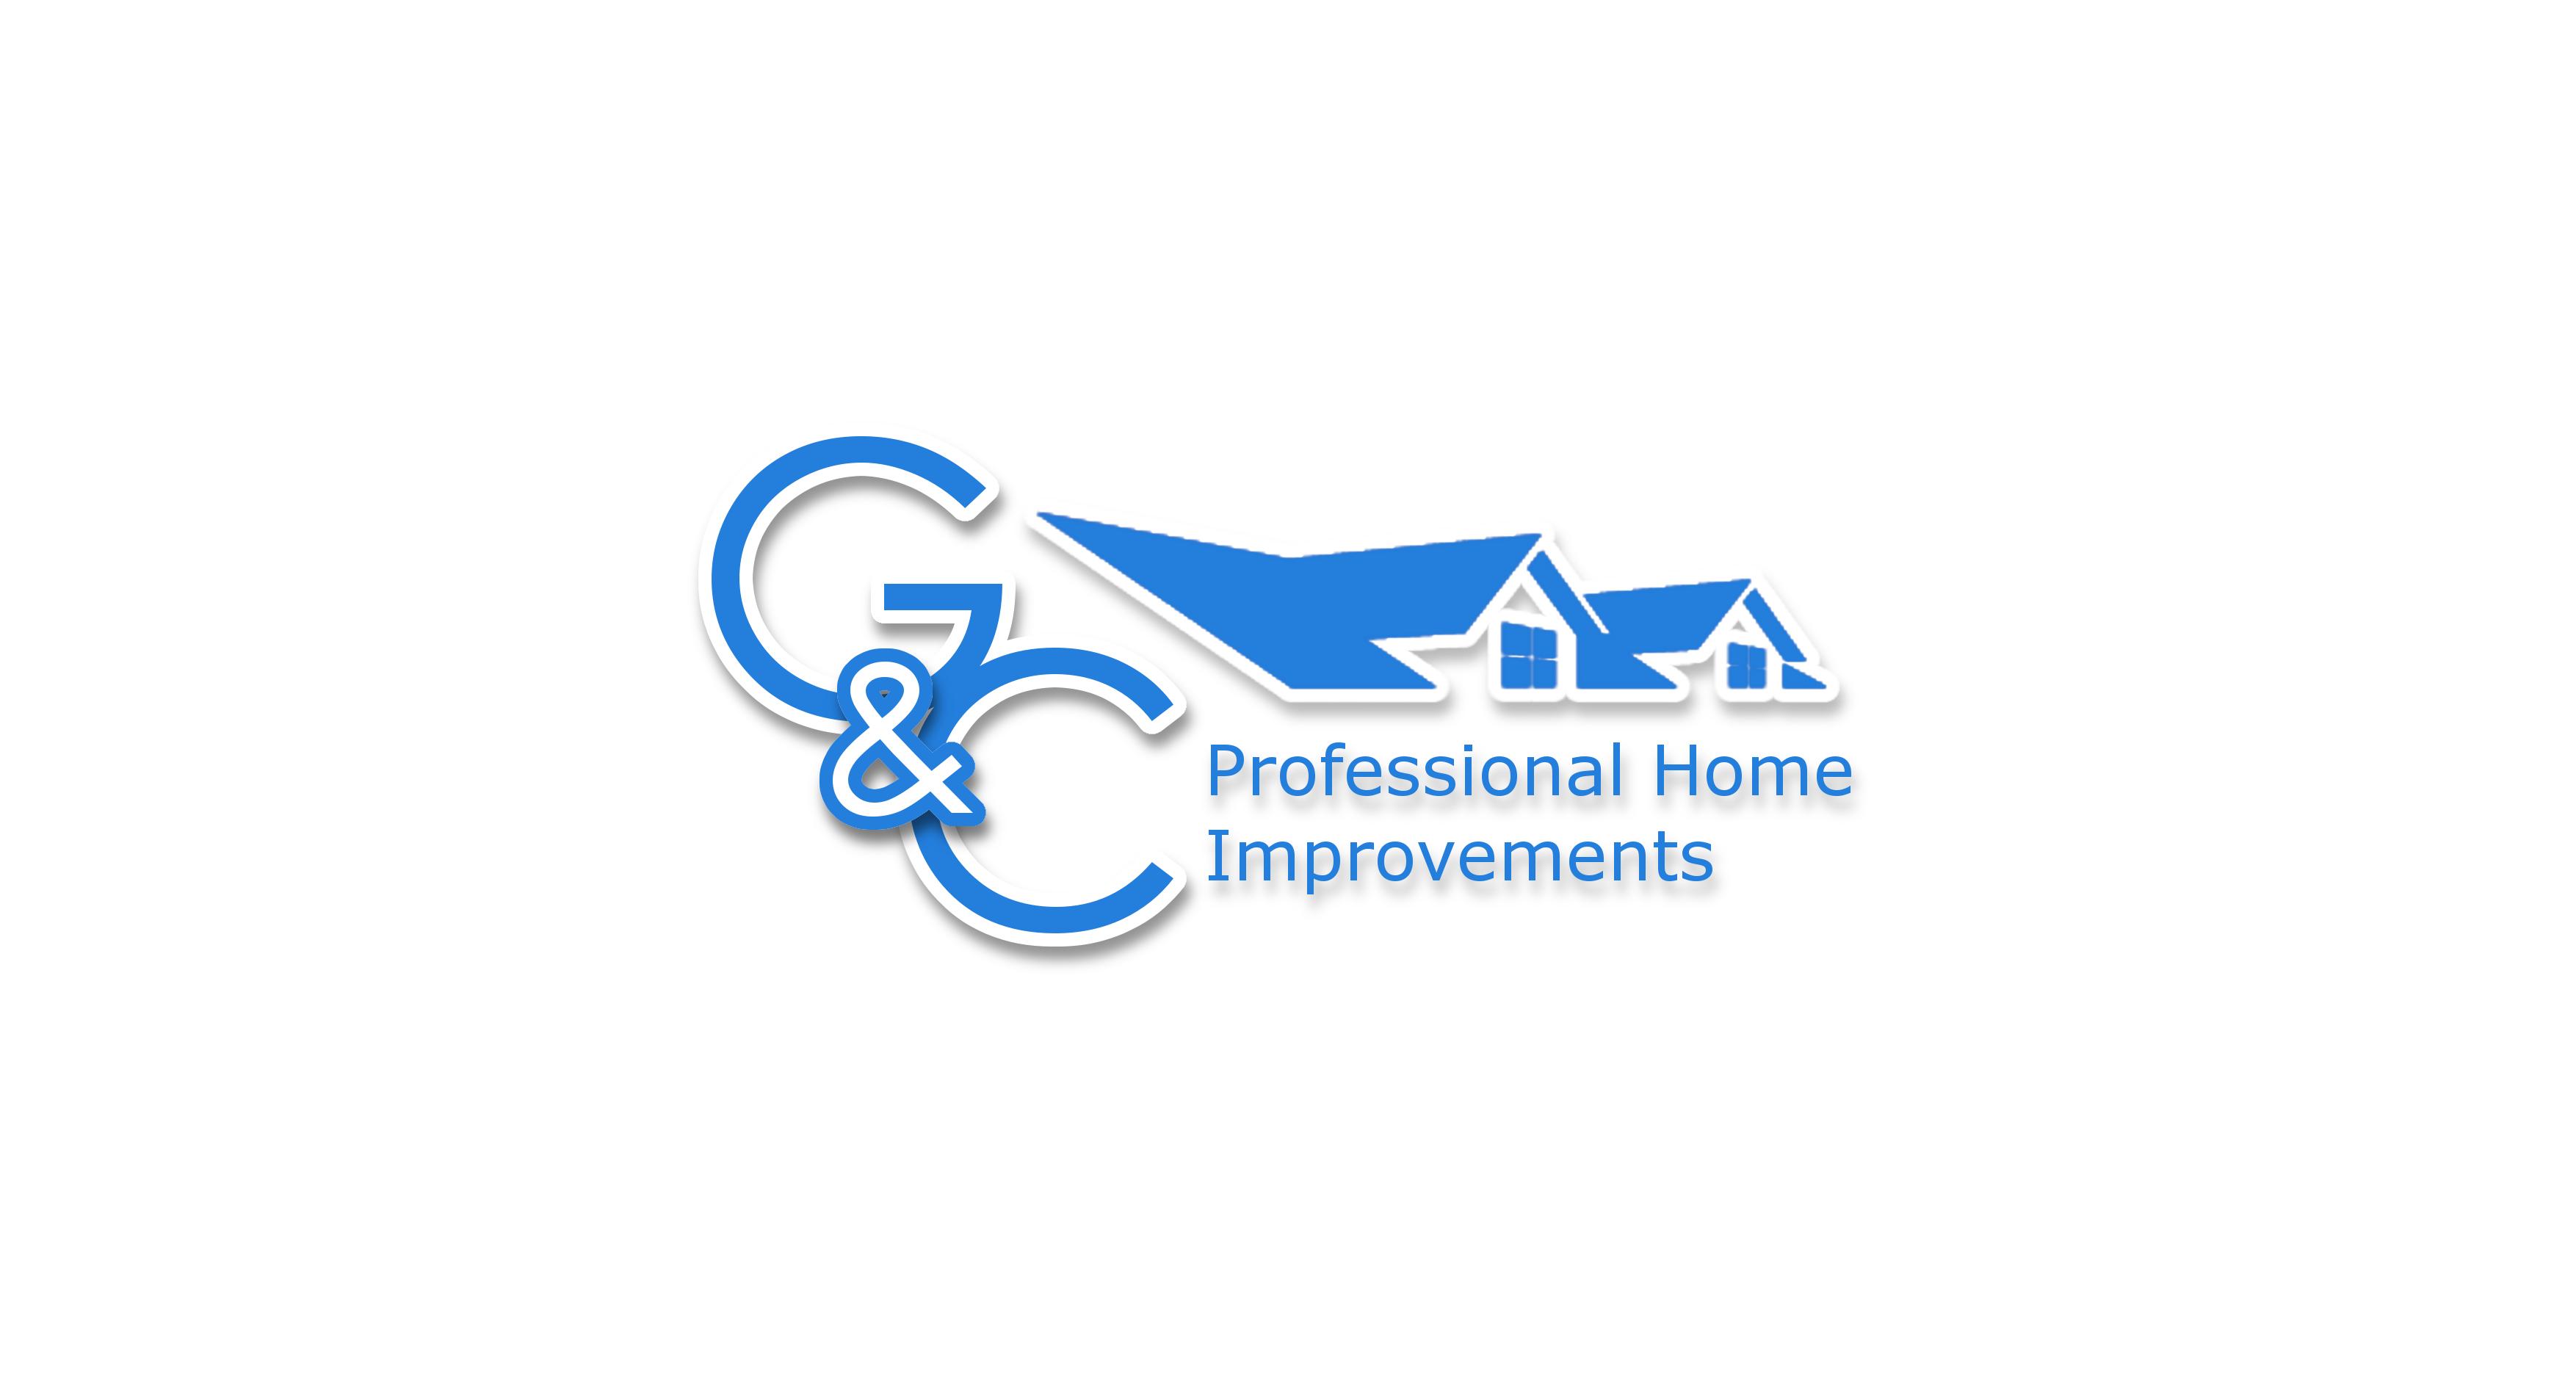 G&C Professional Home Improvements Verified Logo